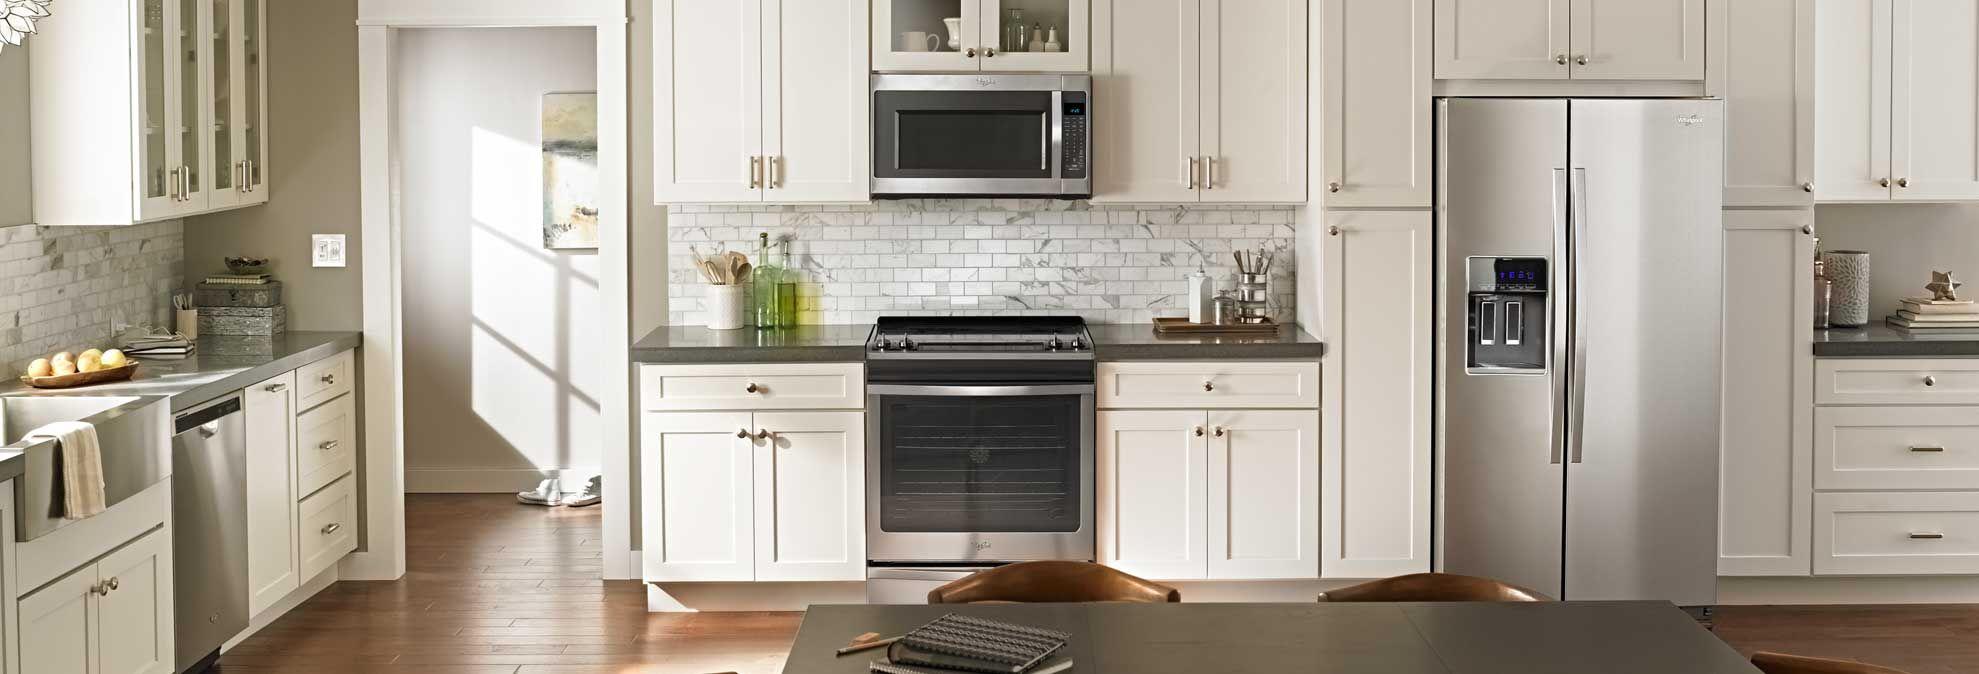 A Mid-Range Kitchen Makeover for $25K to $50K | Kitchens ...